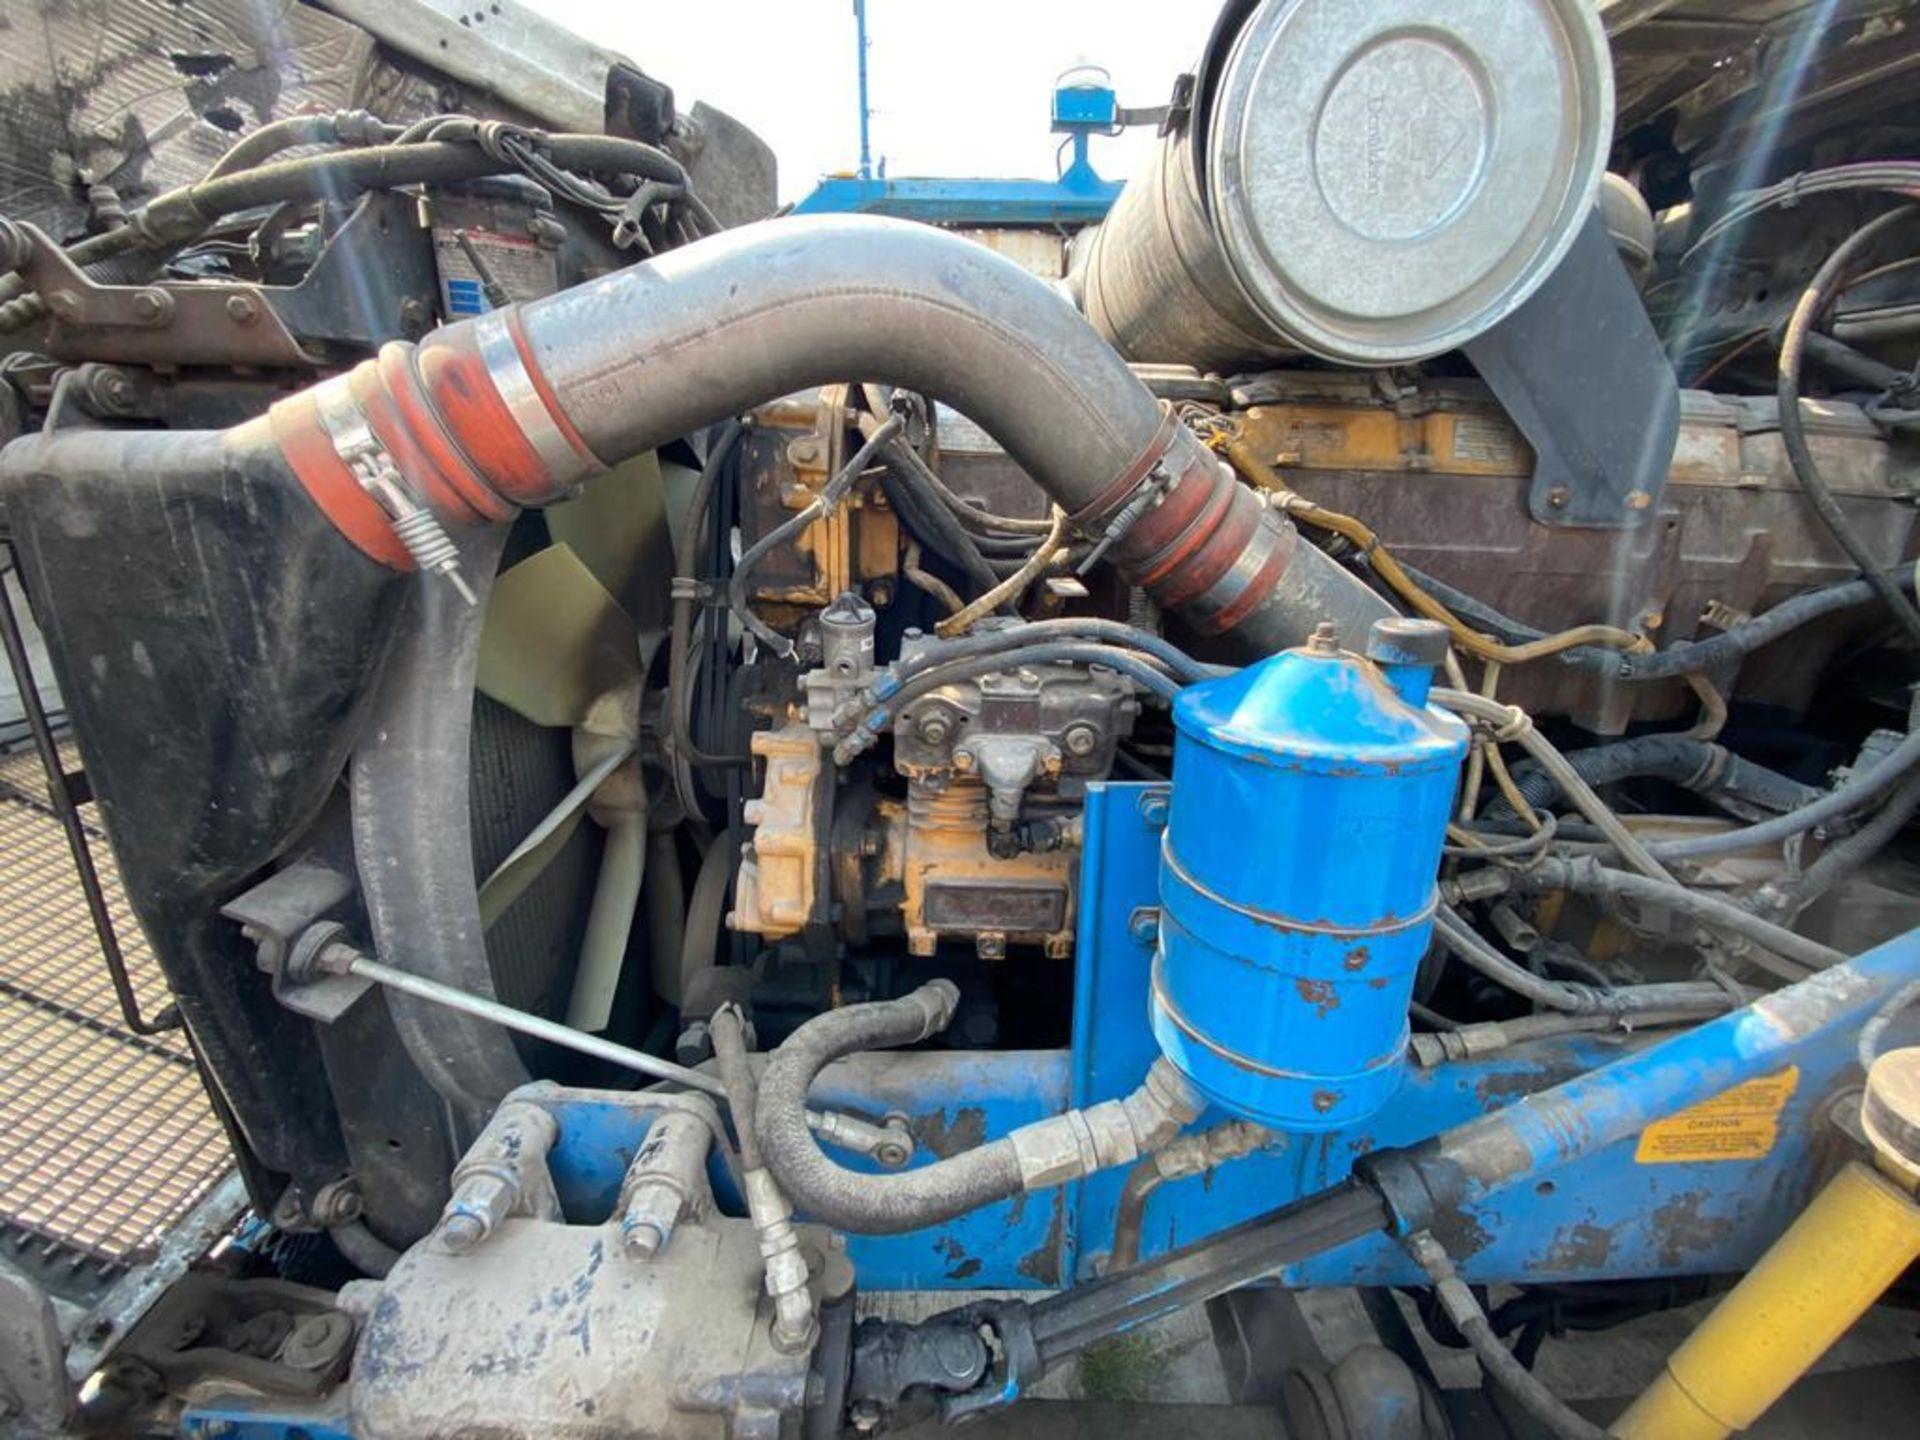 1999 Kenworth Sleeper truck tractor, standard transmission of 18 speeds - Image 67 of 72